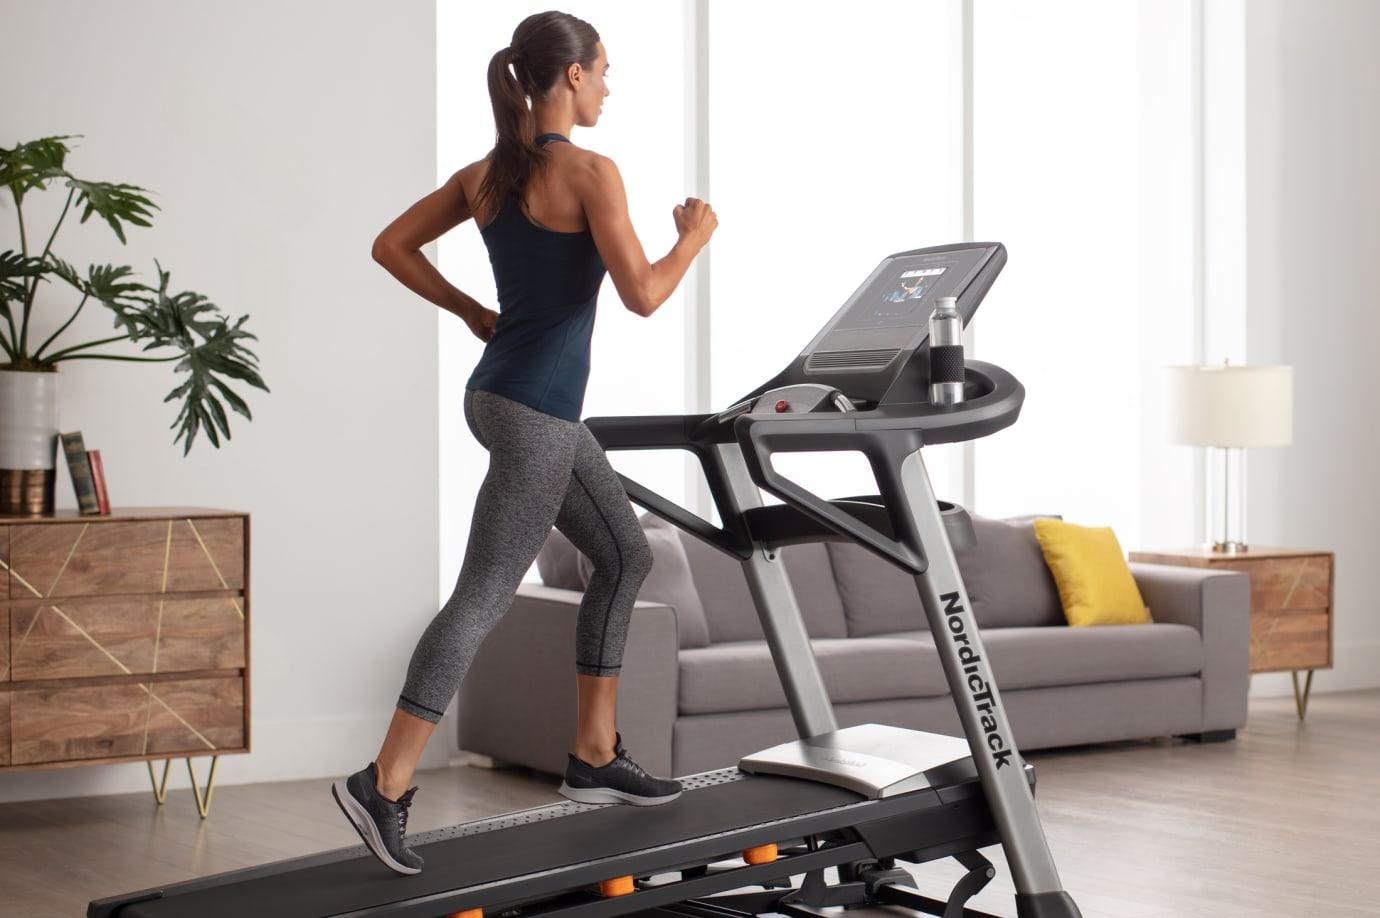 NordicTrack Elite 1000 Treadmill